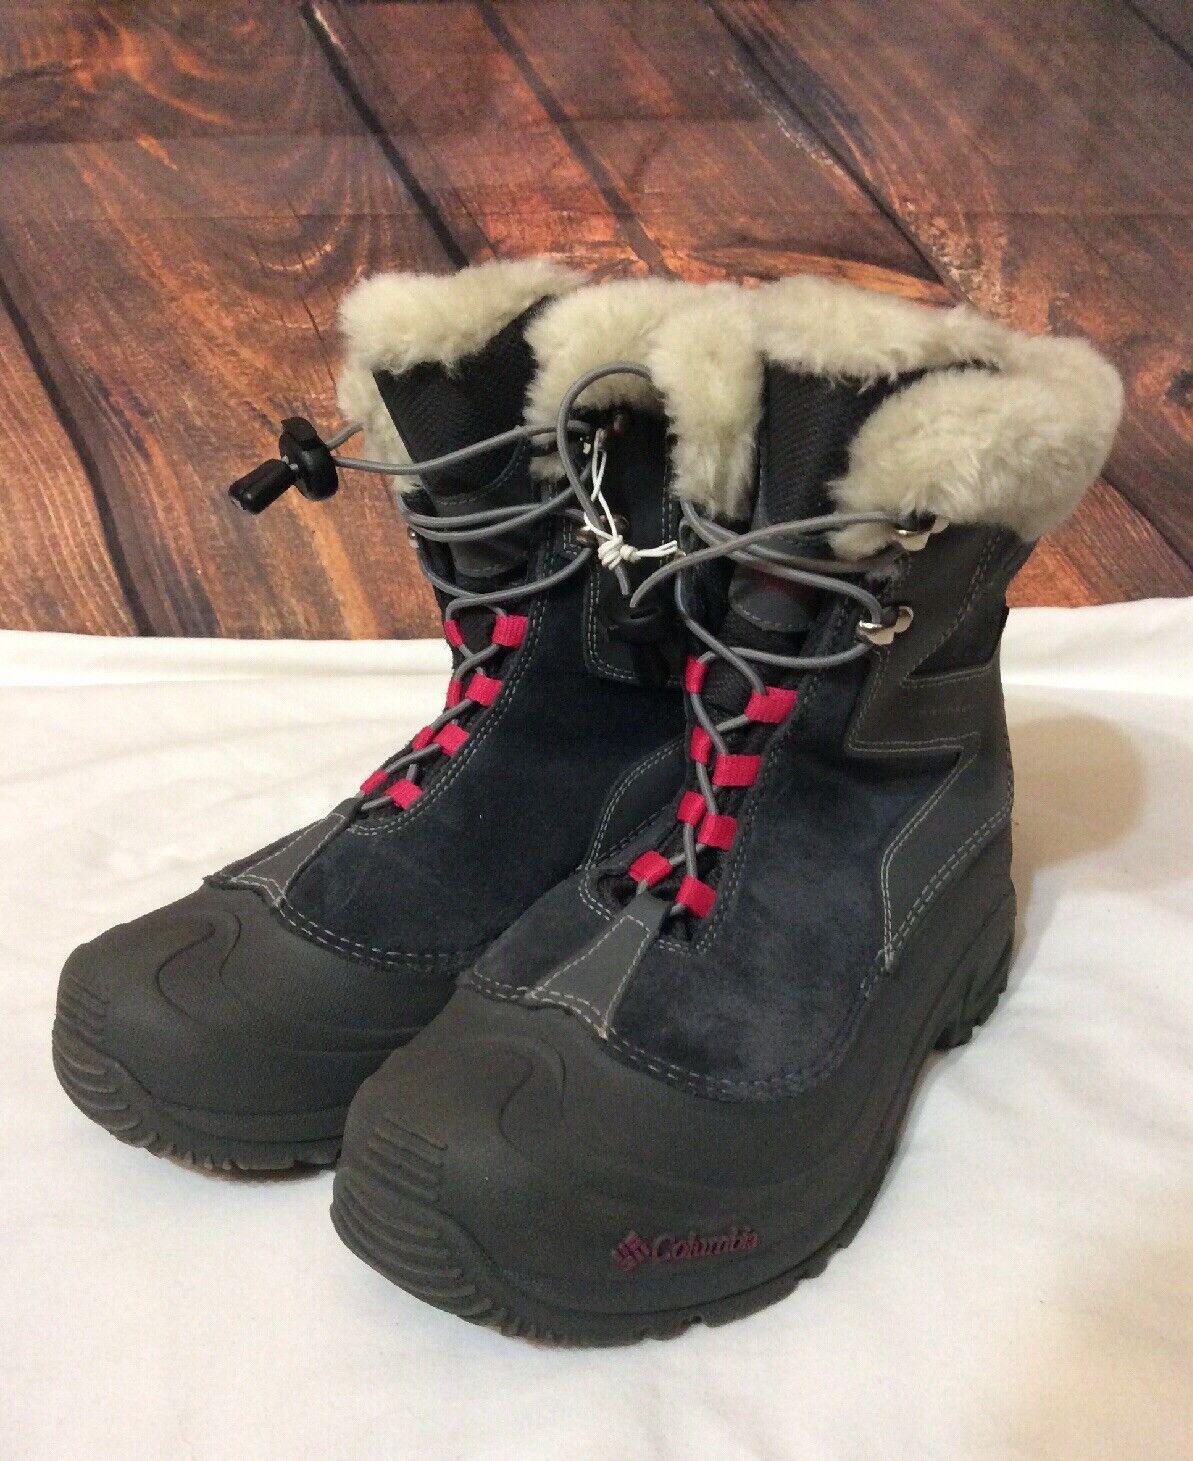 Women's Columbia Omni Heat suede Gray Multicolor Winter Snow Boots Size 7